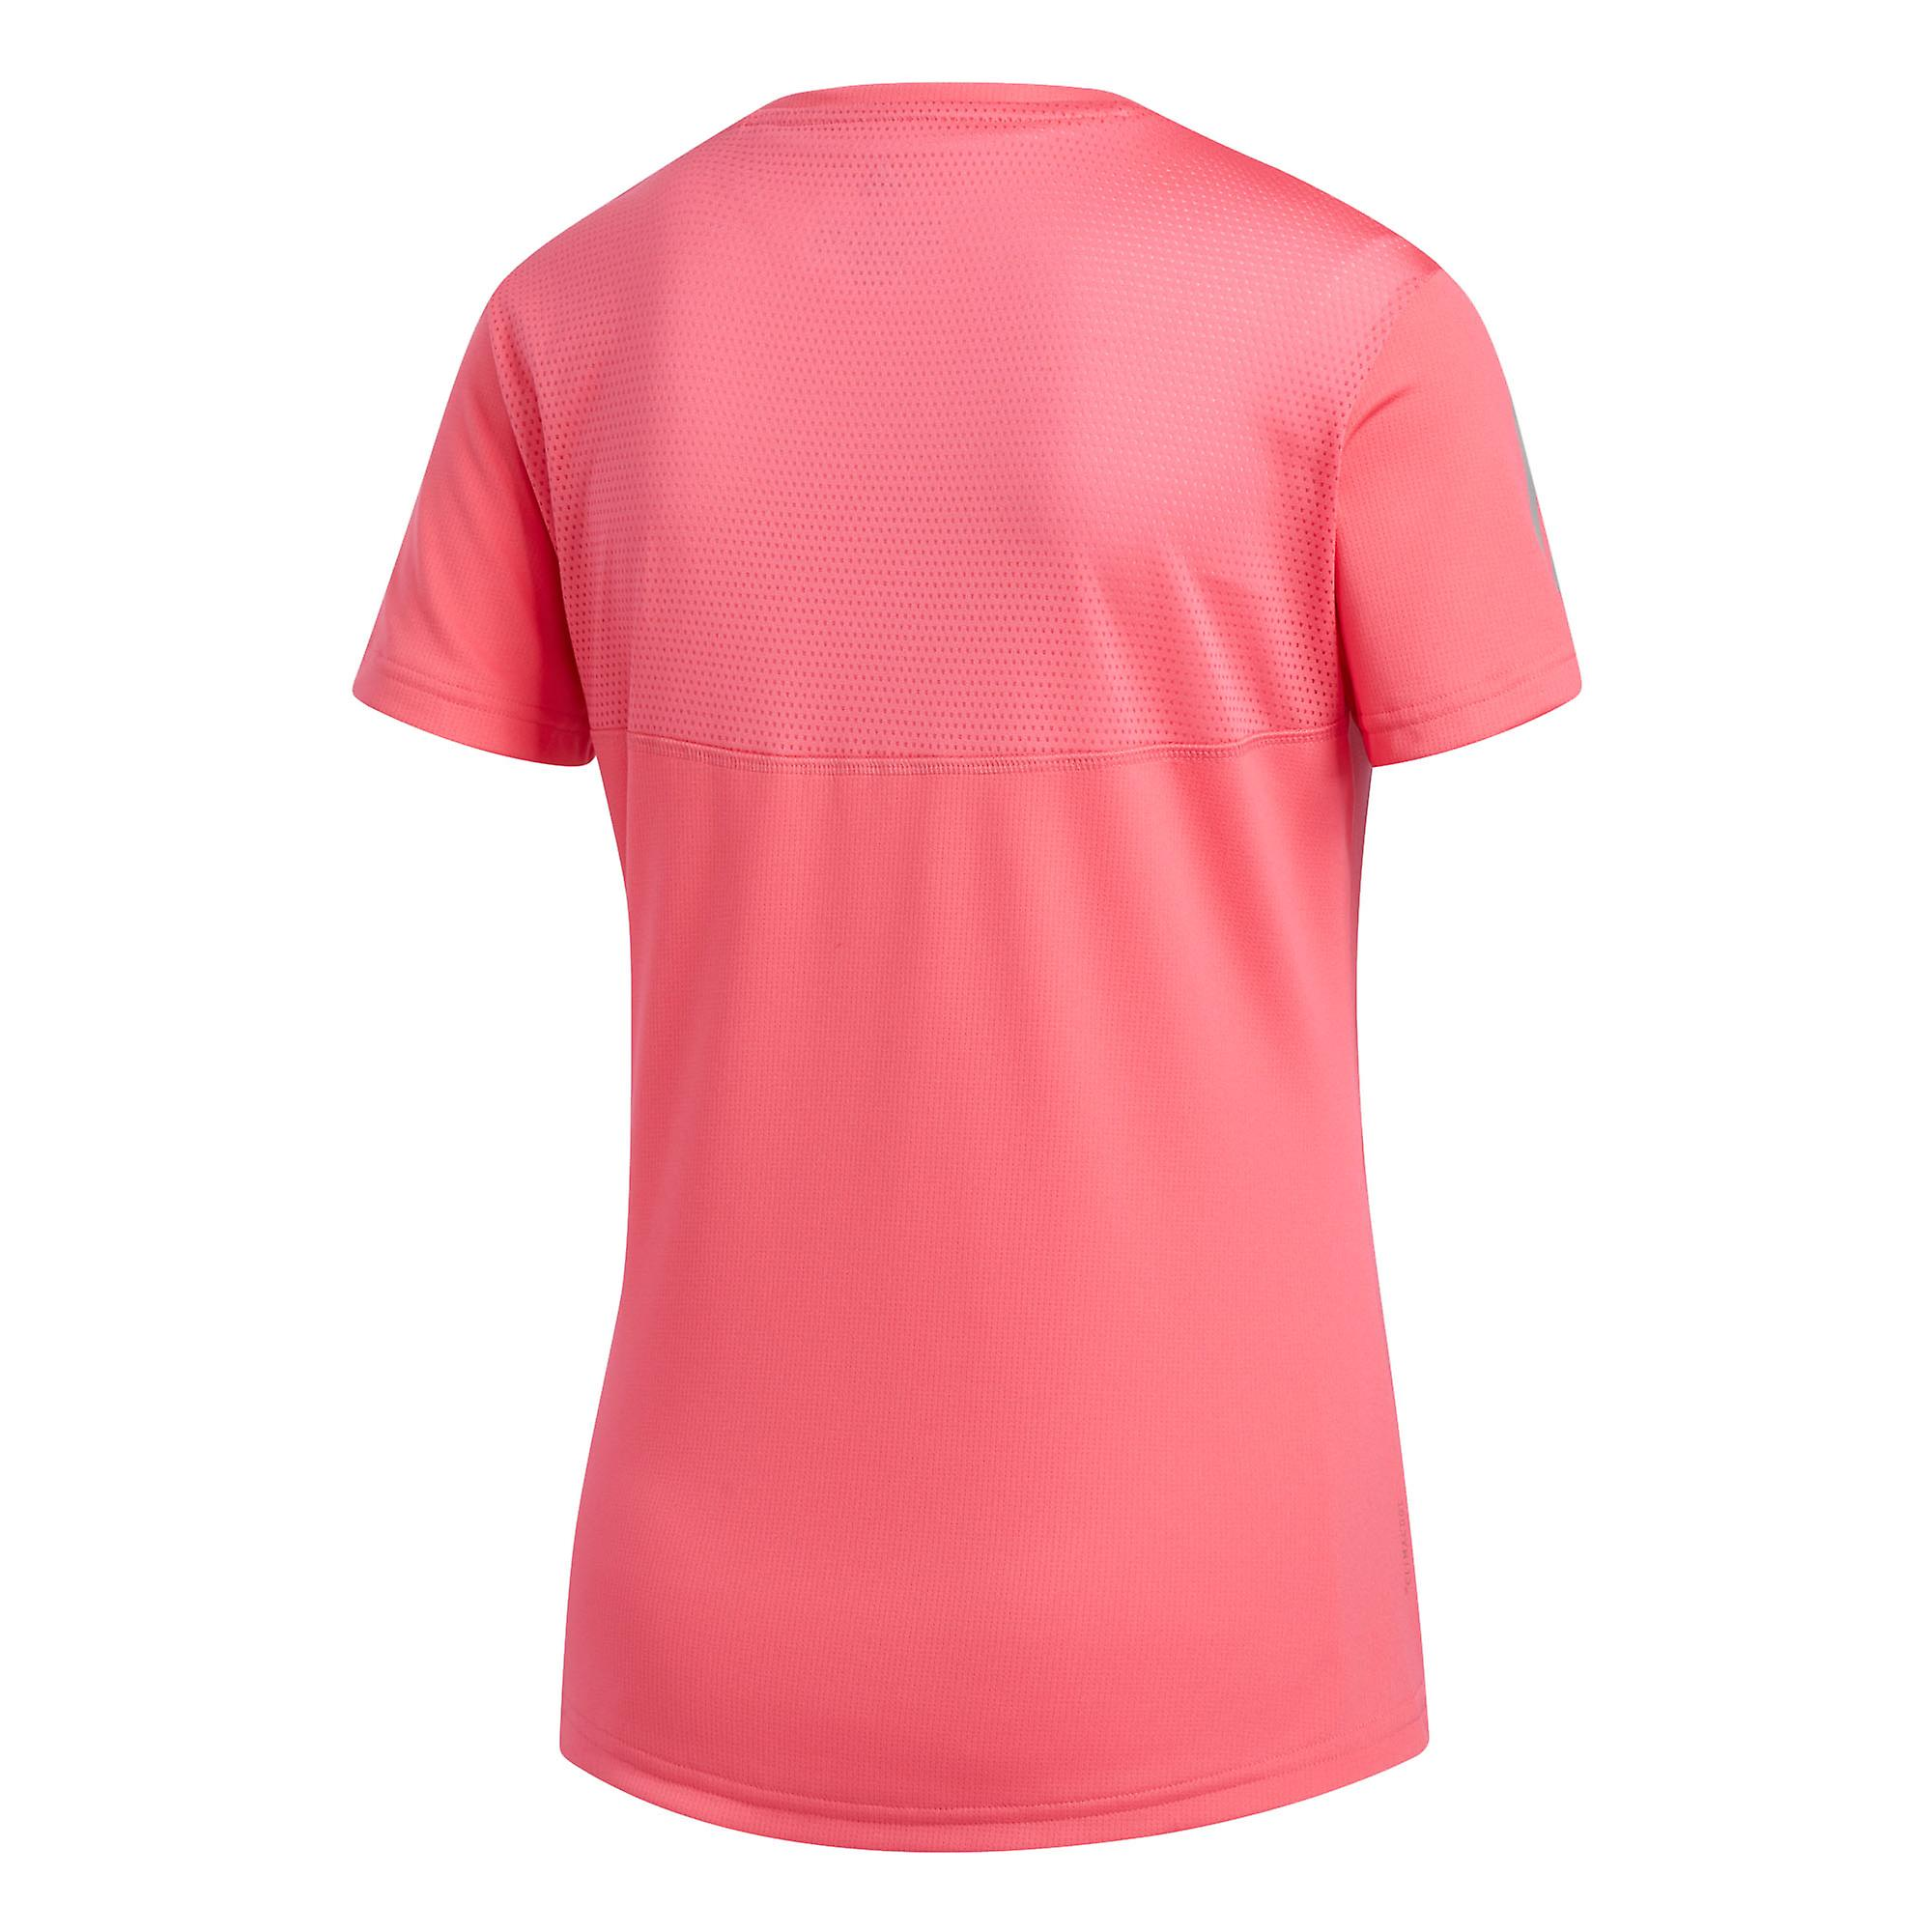 adidas Own The Run Womens Running Fitness Training T-Shirt Tee Pink